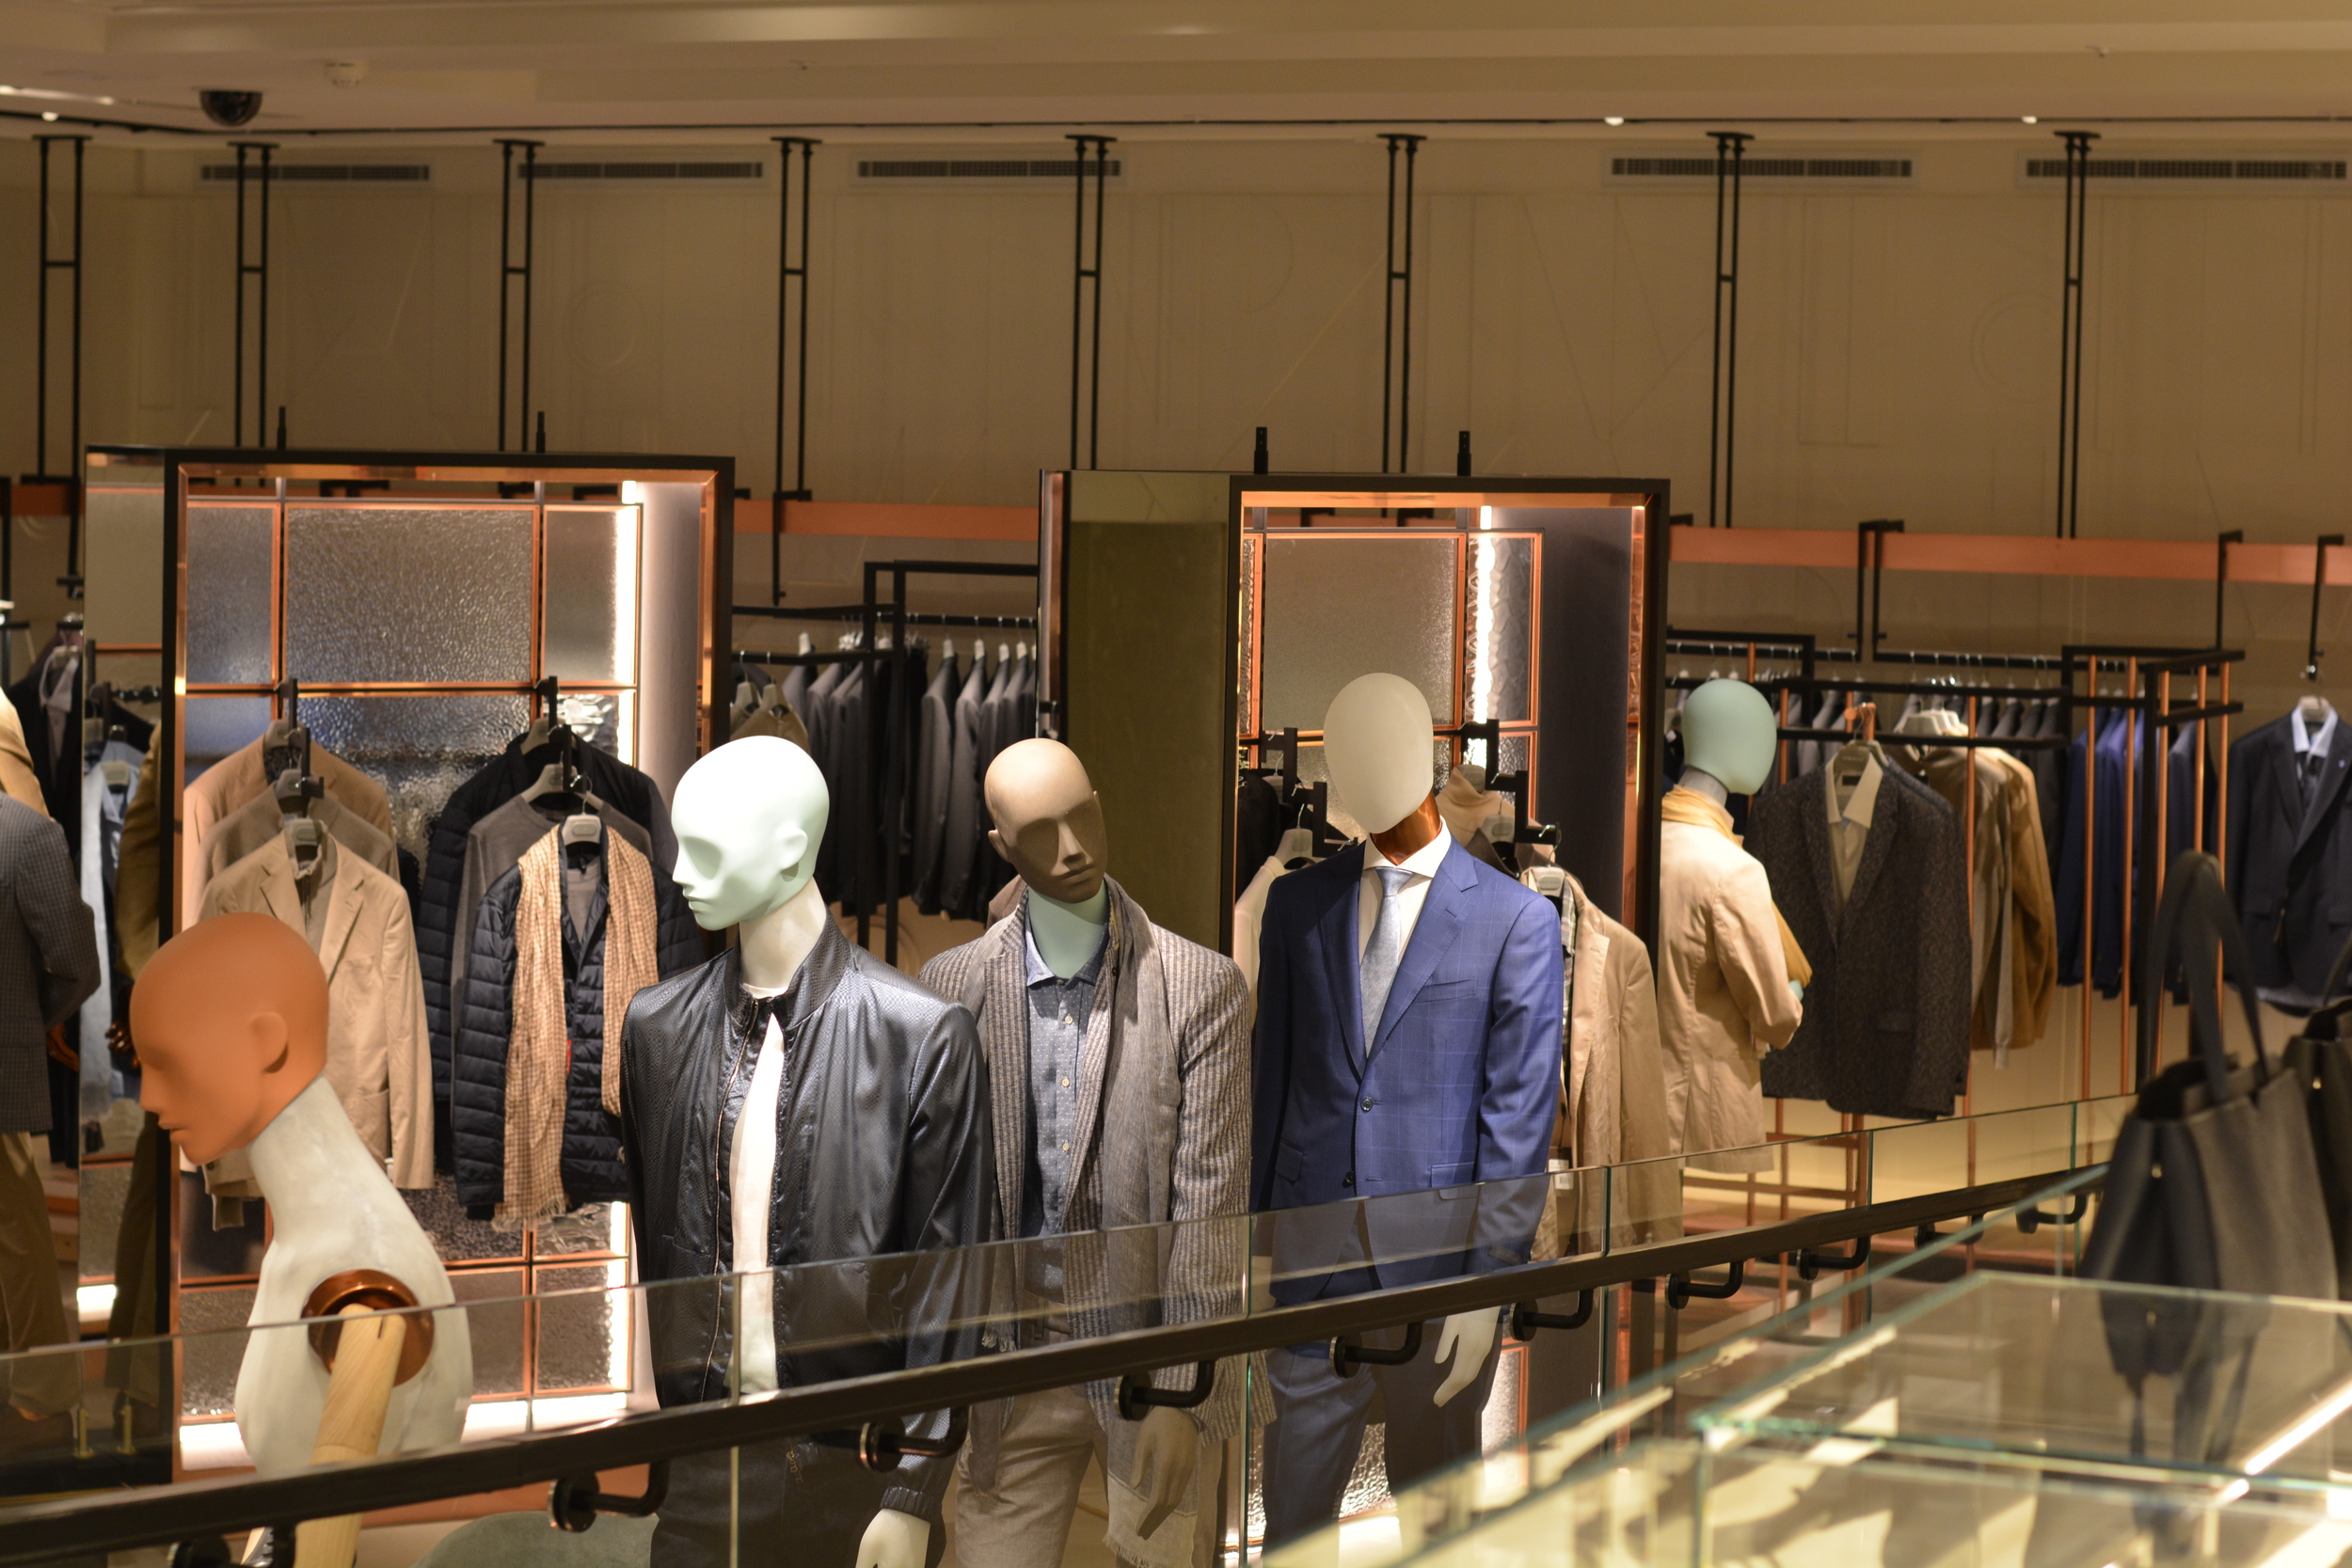 Harvey Nichols Menswear | Tailoring | Sam Squire UK Male Fashion & Lifestyle Blogger